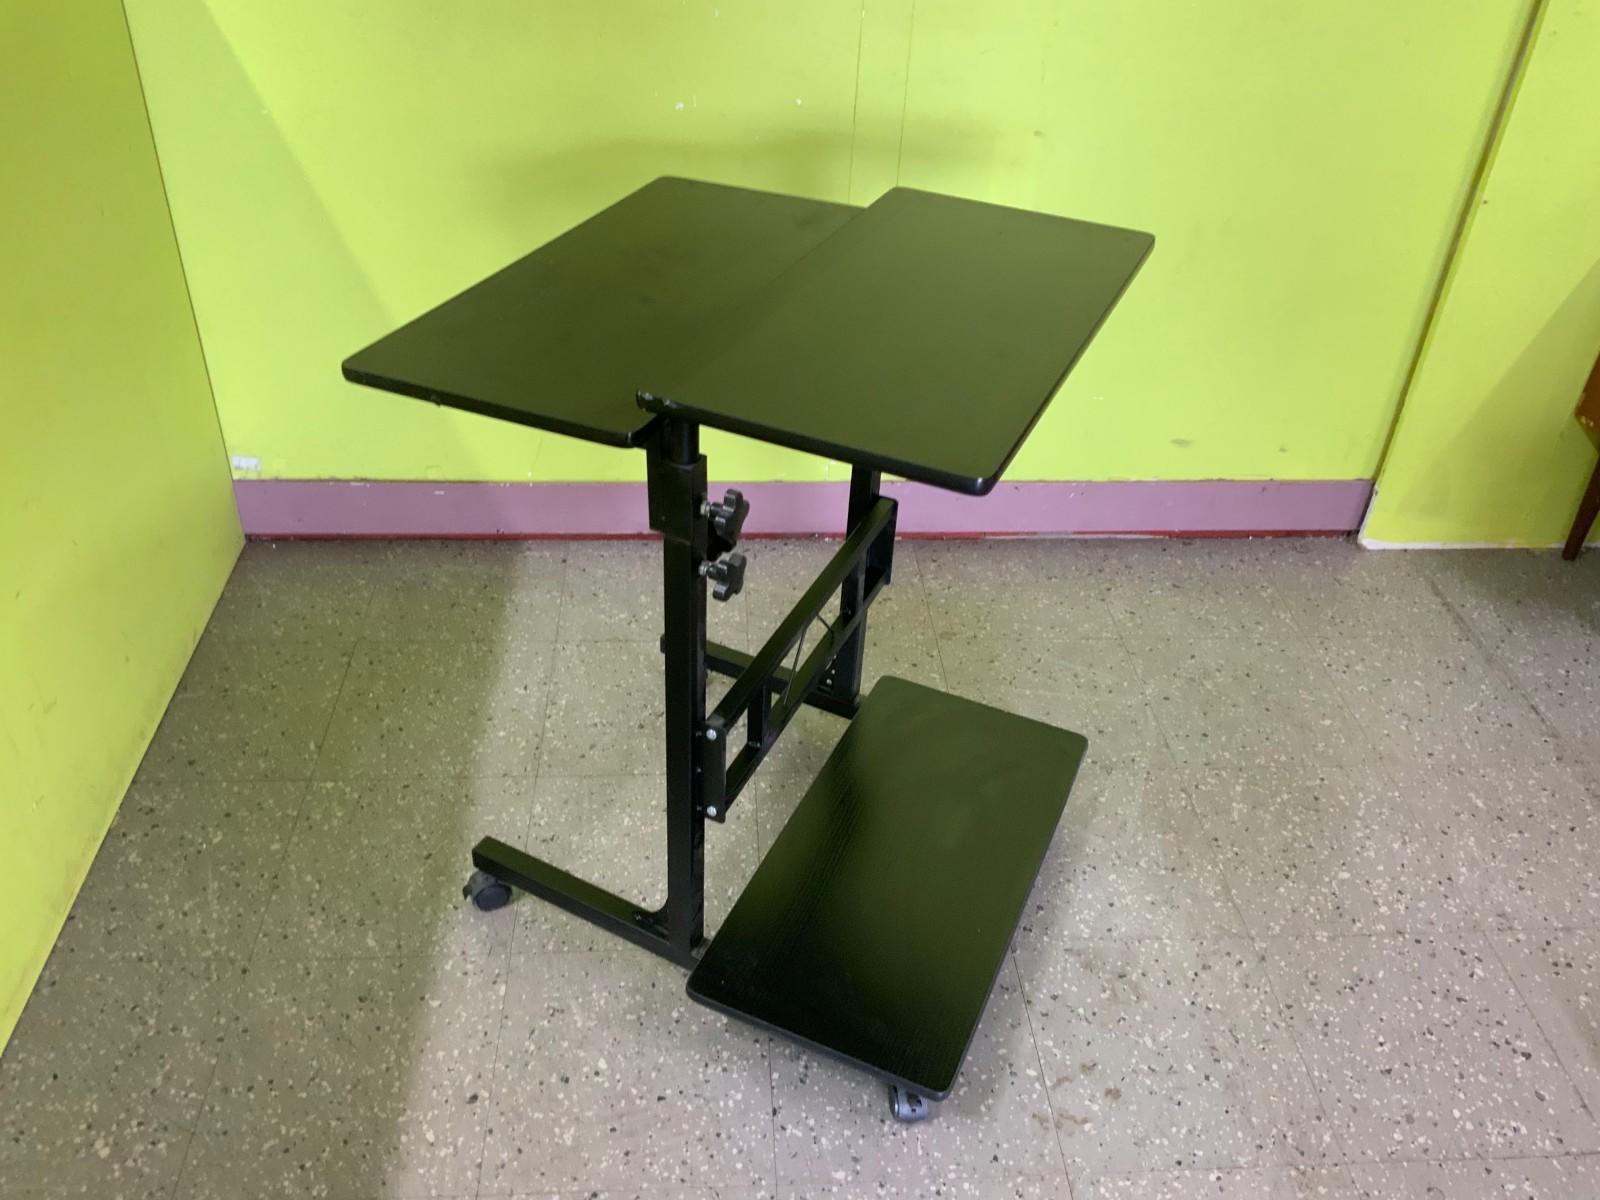 Surprising Its In The Sale Black Computer Desk In Lancing Friday Ad Interior Design Ideas Tzicisoteloinfo